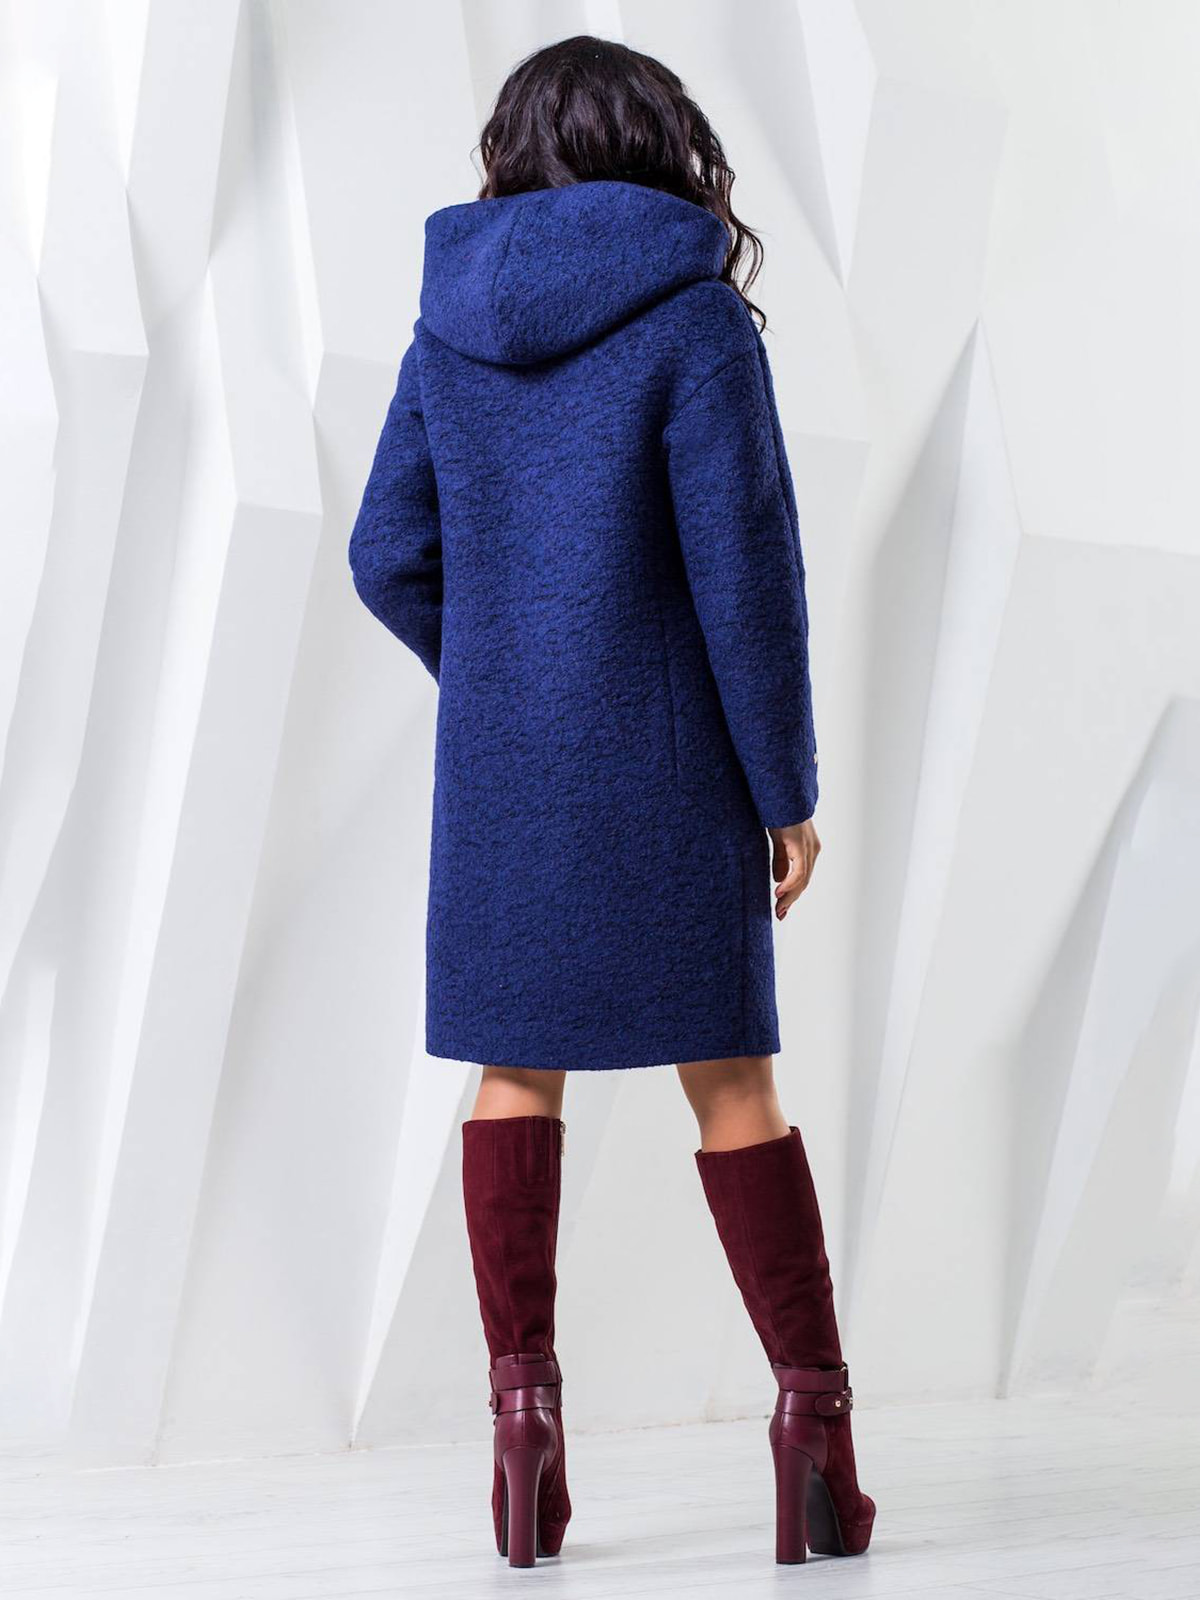 Пальто темно-синее меланжевое | 4616894 | фото 3